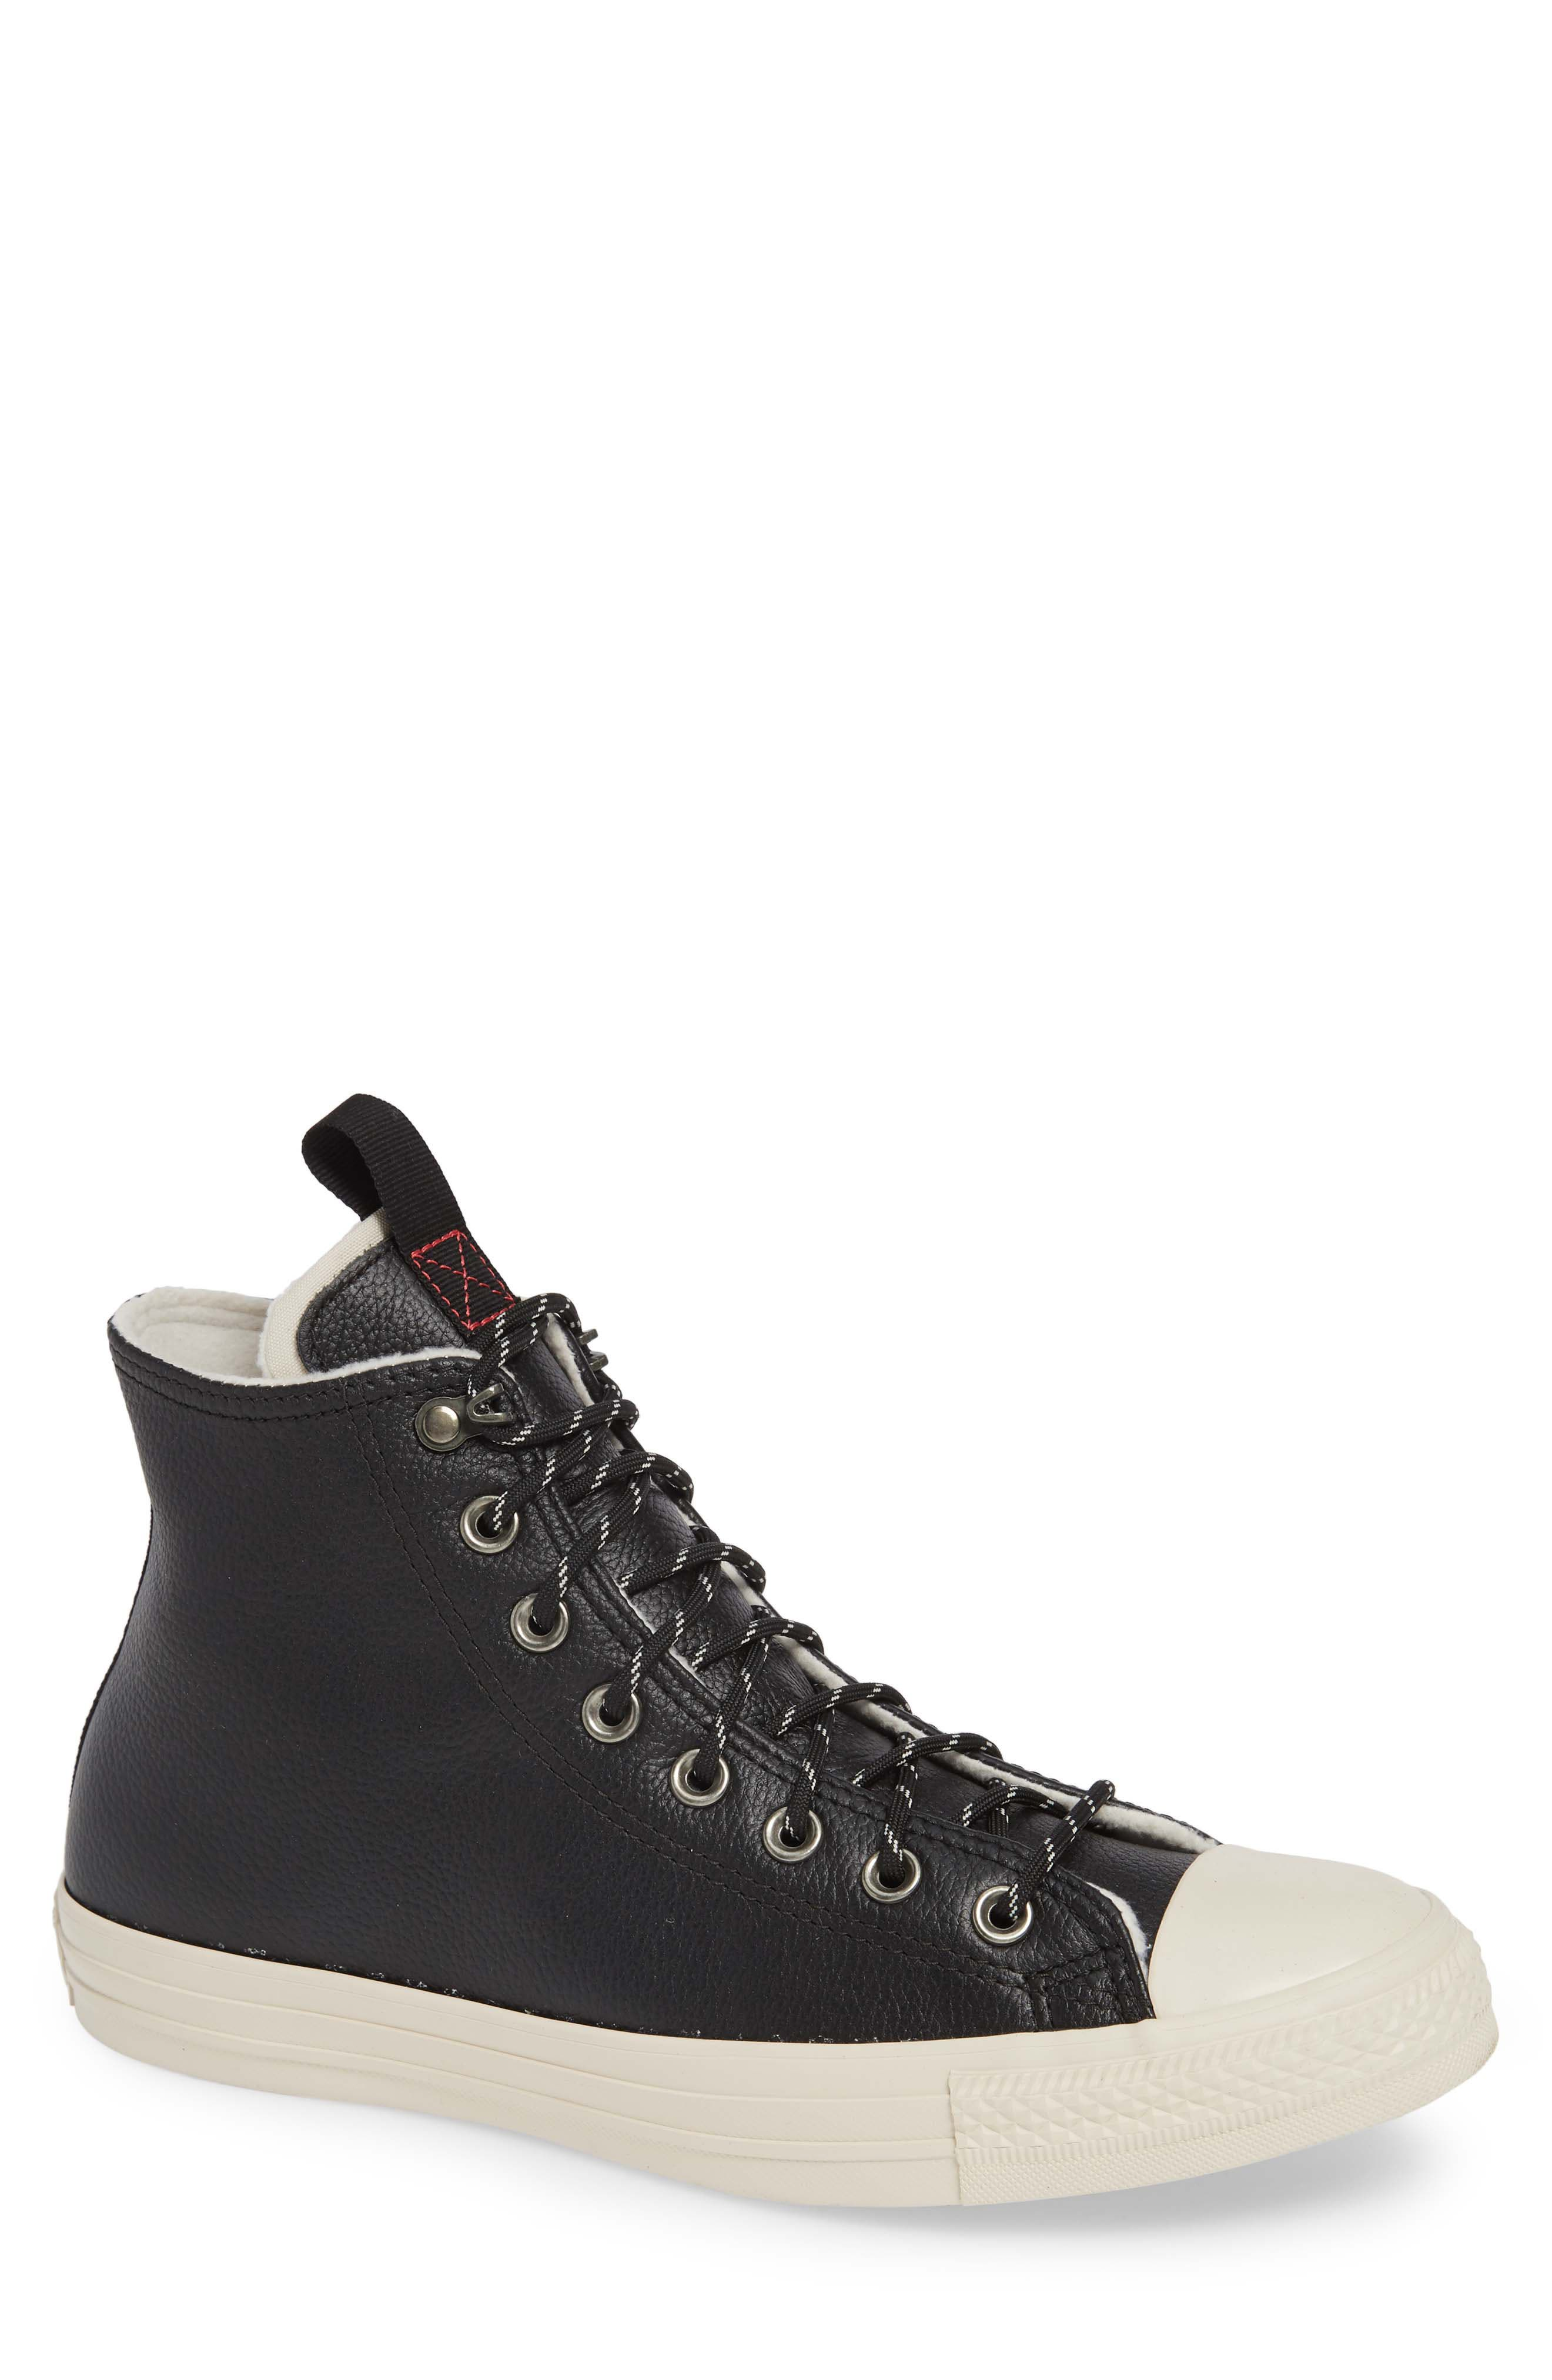 Chuck Taylor<sup>®</sup> All Star<sup>®</sup> Desert Storm Hi Sneaker,                         Main,                         color, MASON/ BLACK/ DRIFTWOOD